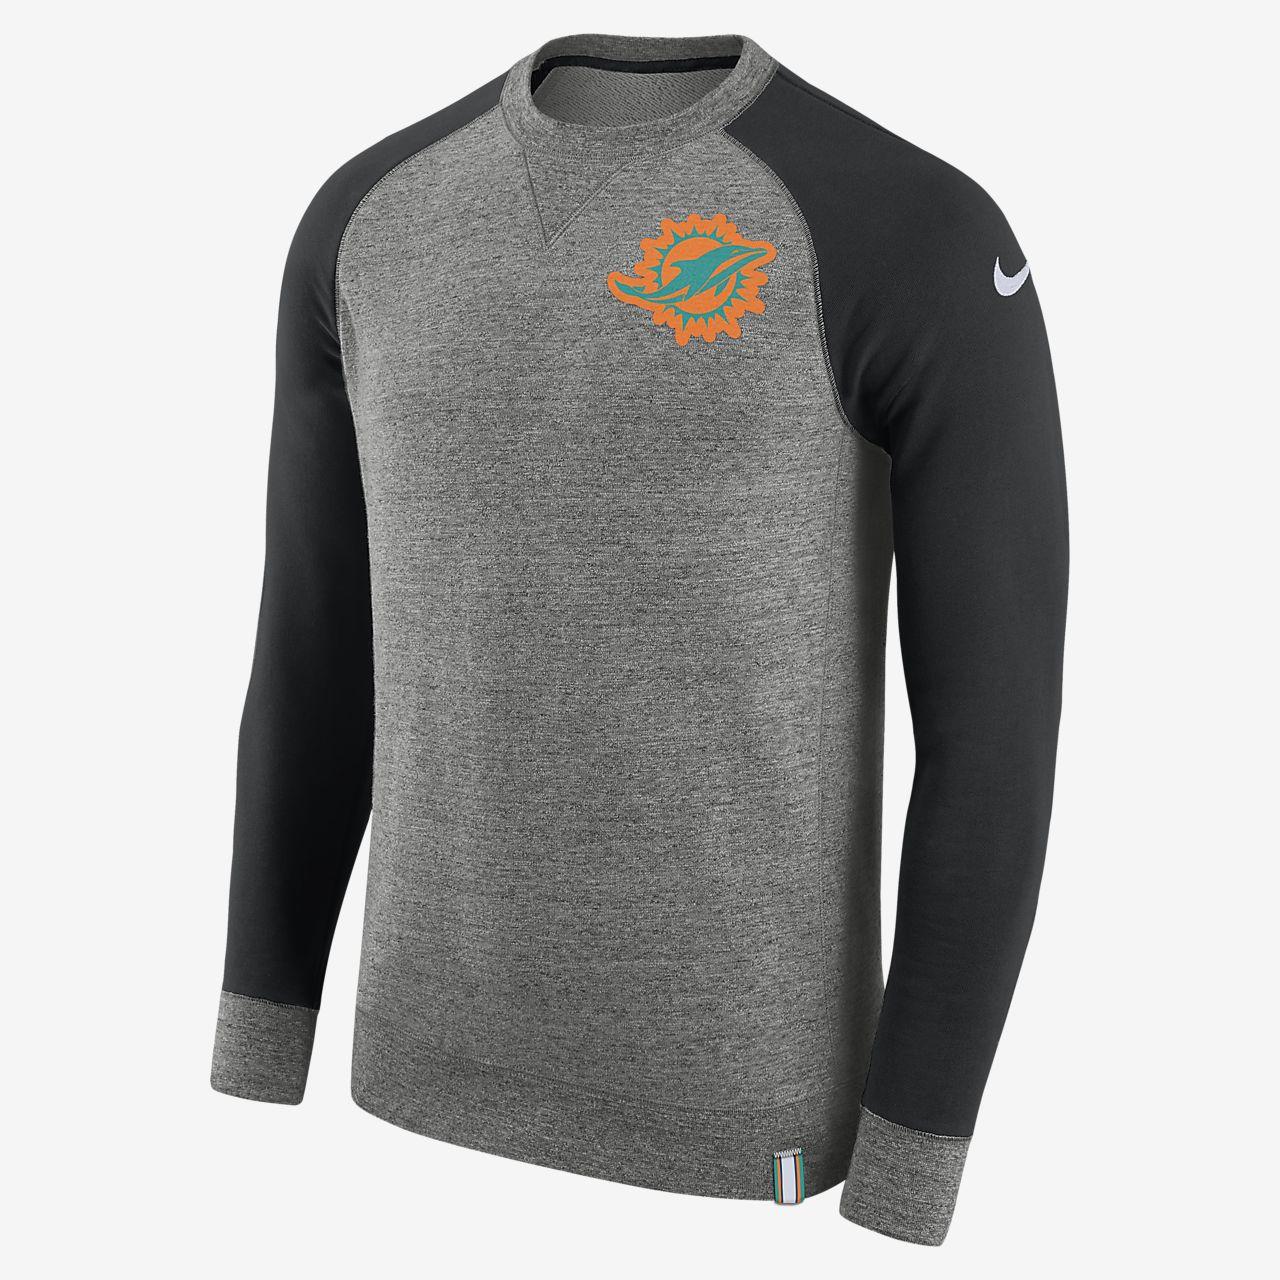 Nike AW77 (NFL Dolphins) genser for herre